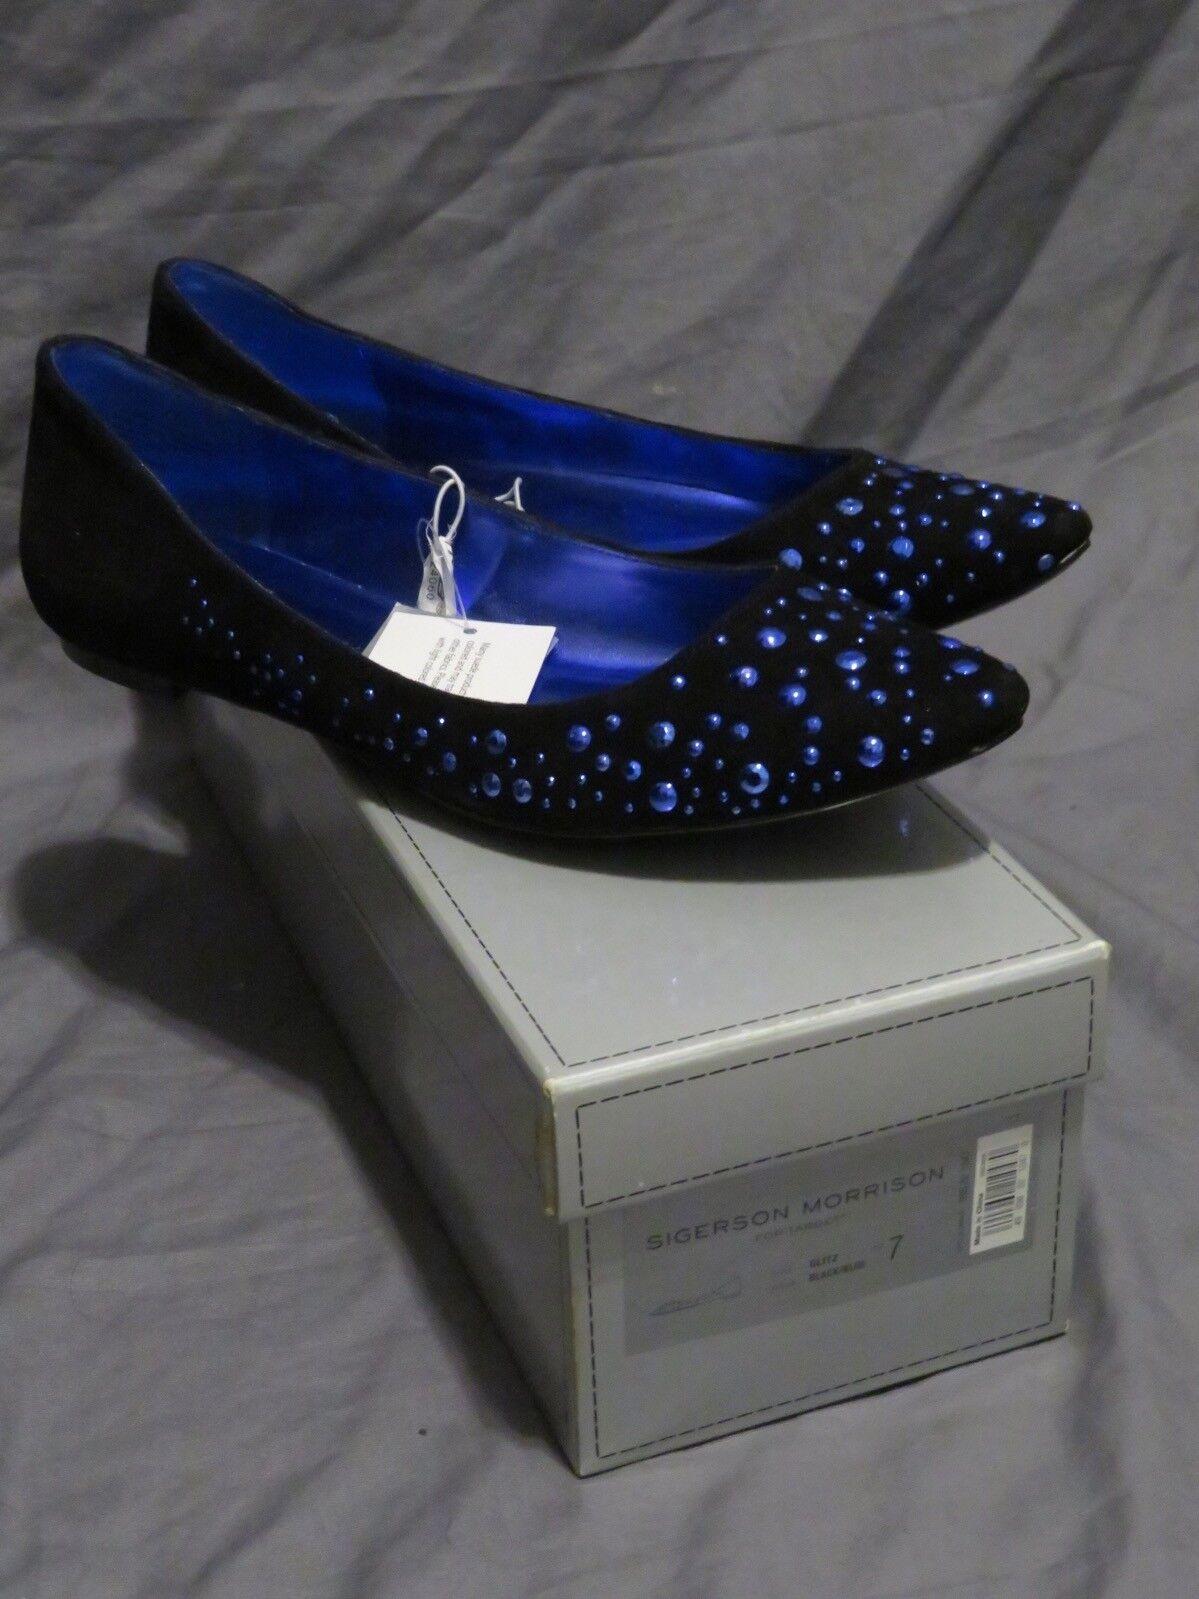 New Women's Sigerson Morrison Glitz Glitz Glitz Black Suede  bluee Studded Ballet Flats Sz 7 06ec36